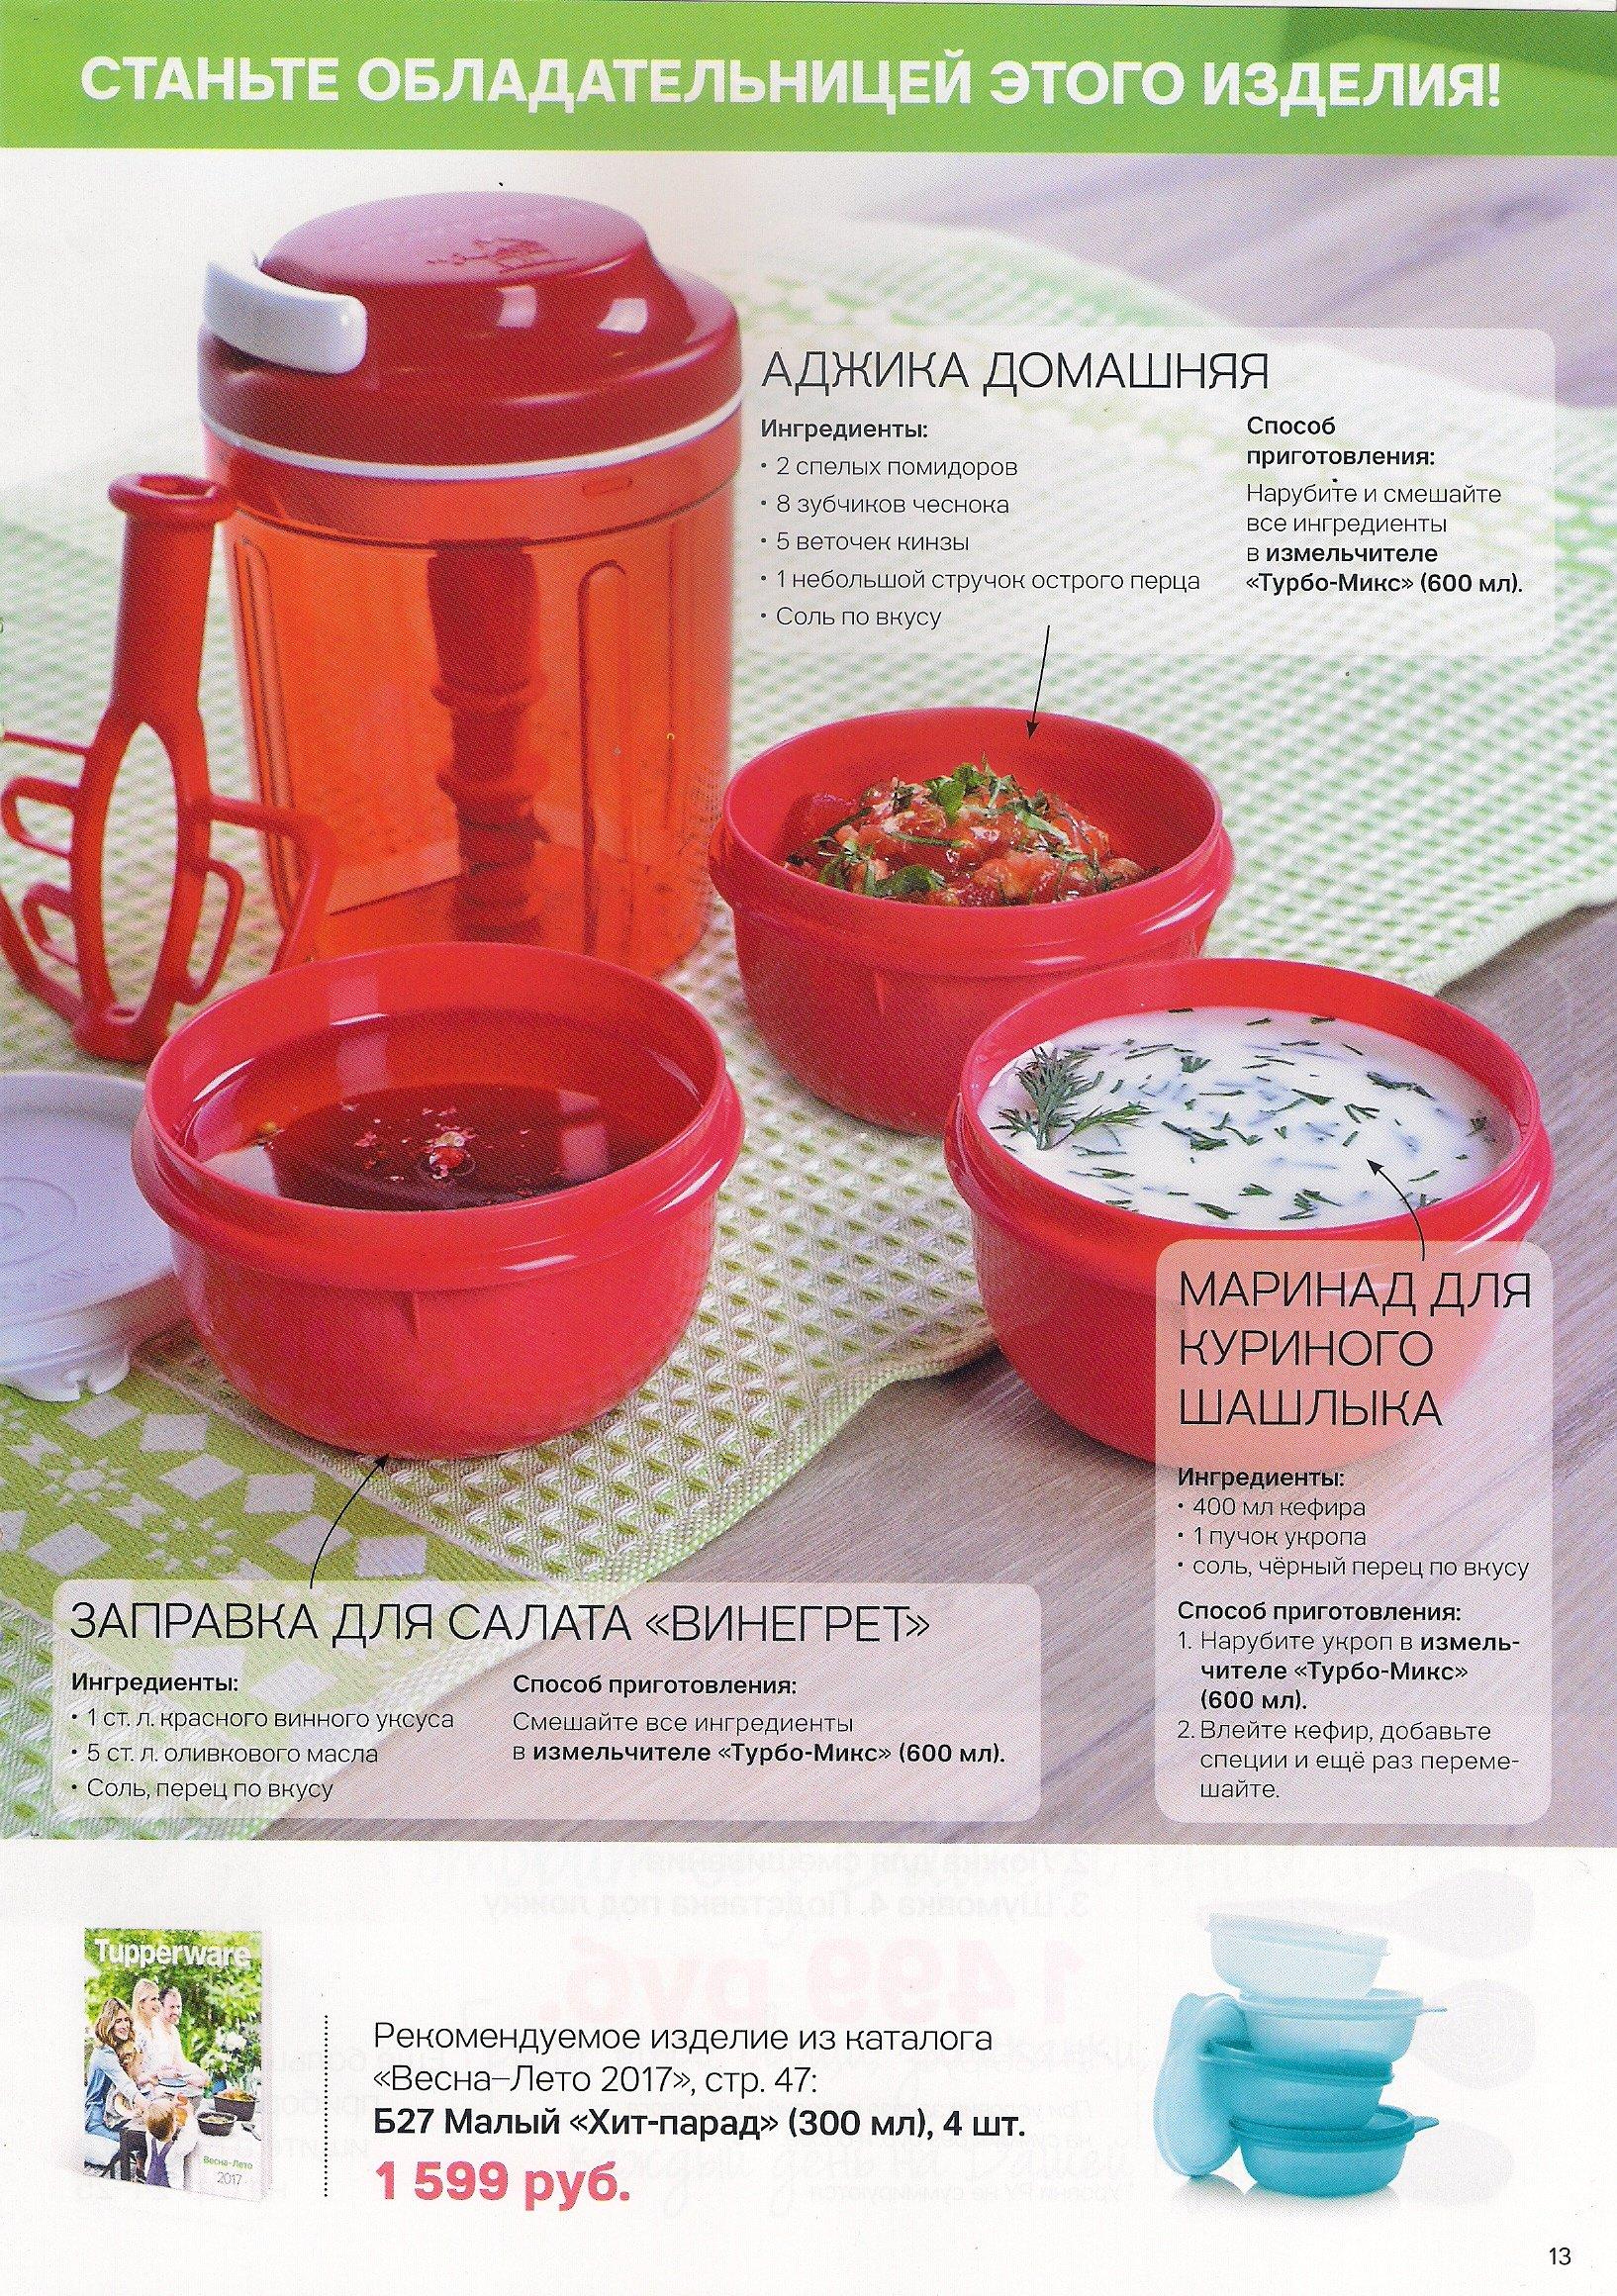 https://tupperware-online.ru/images/upload/13i.jpg